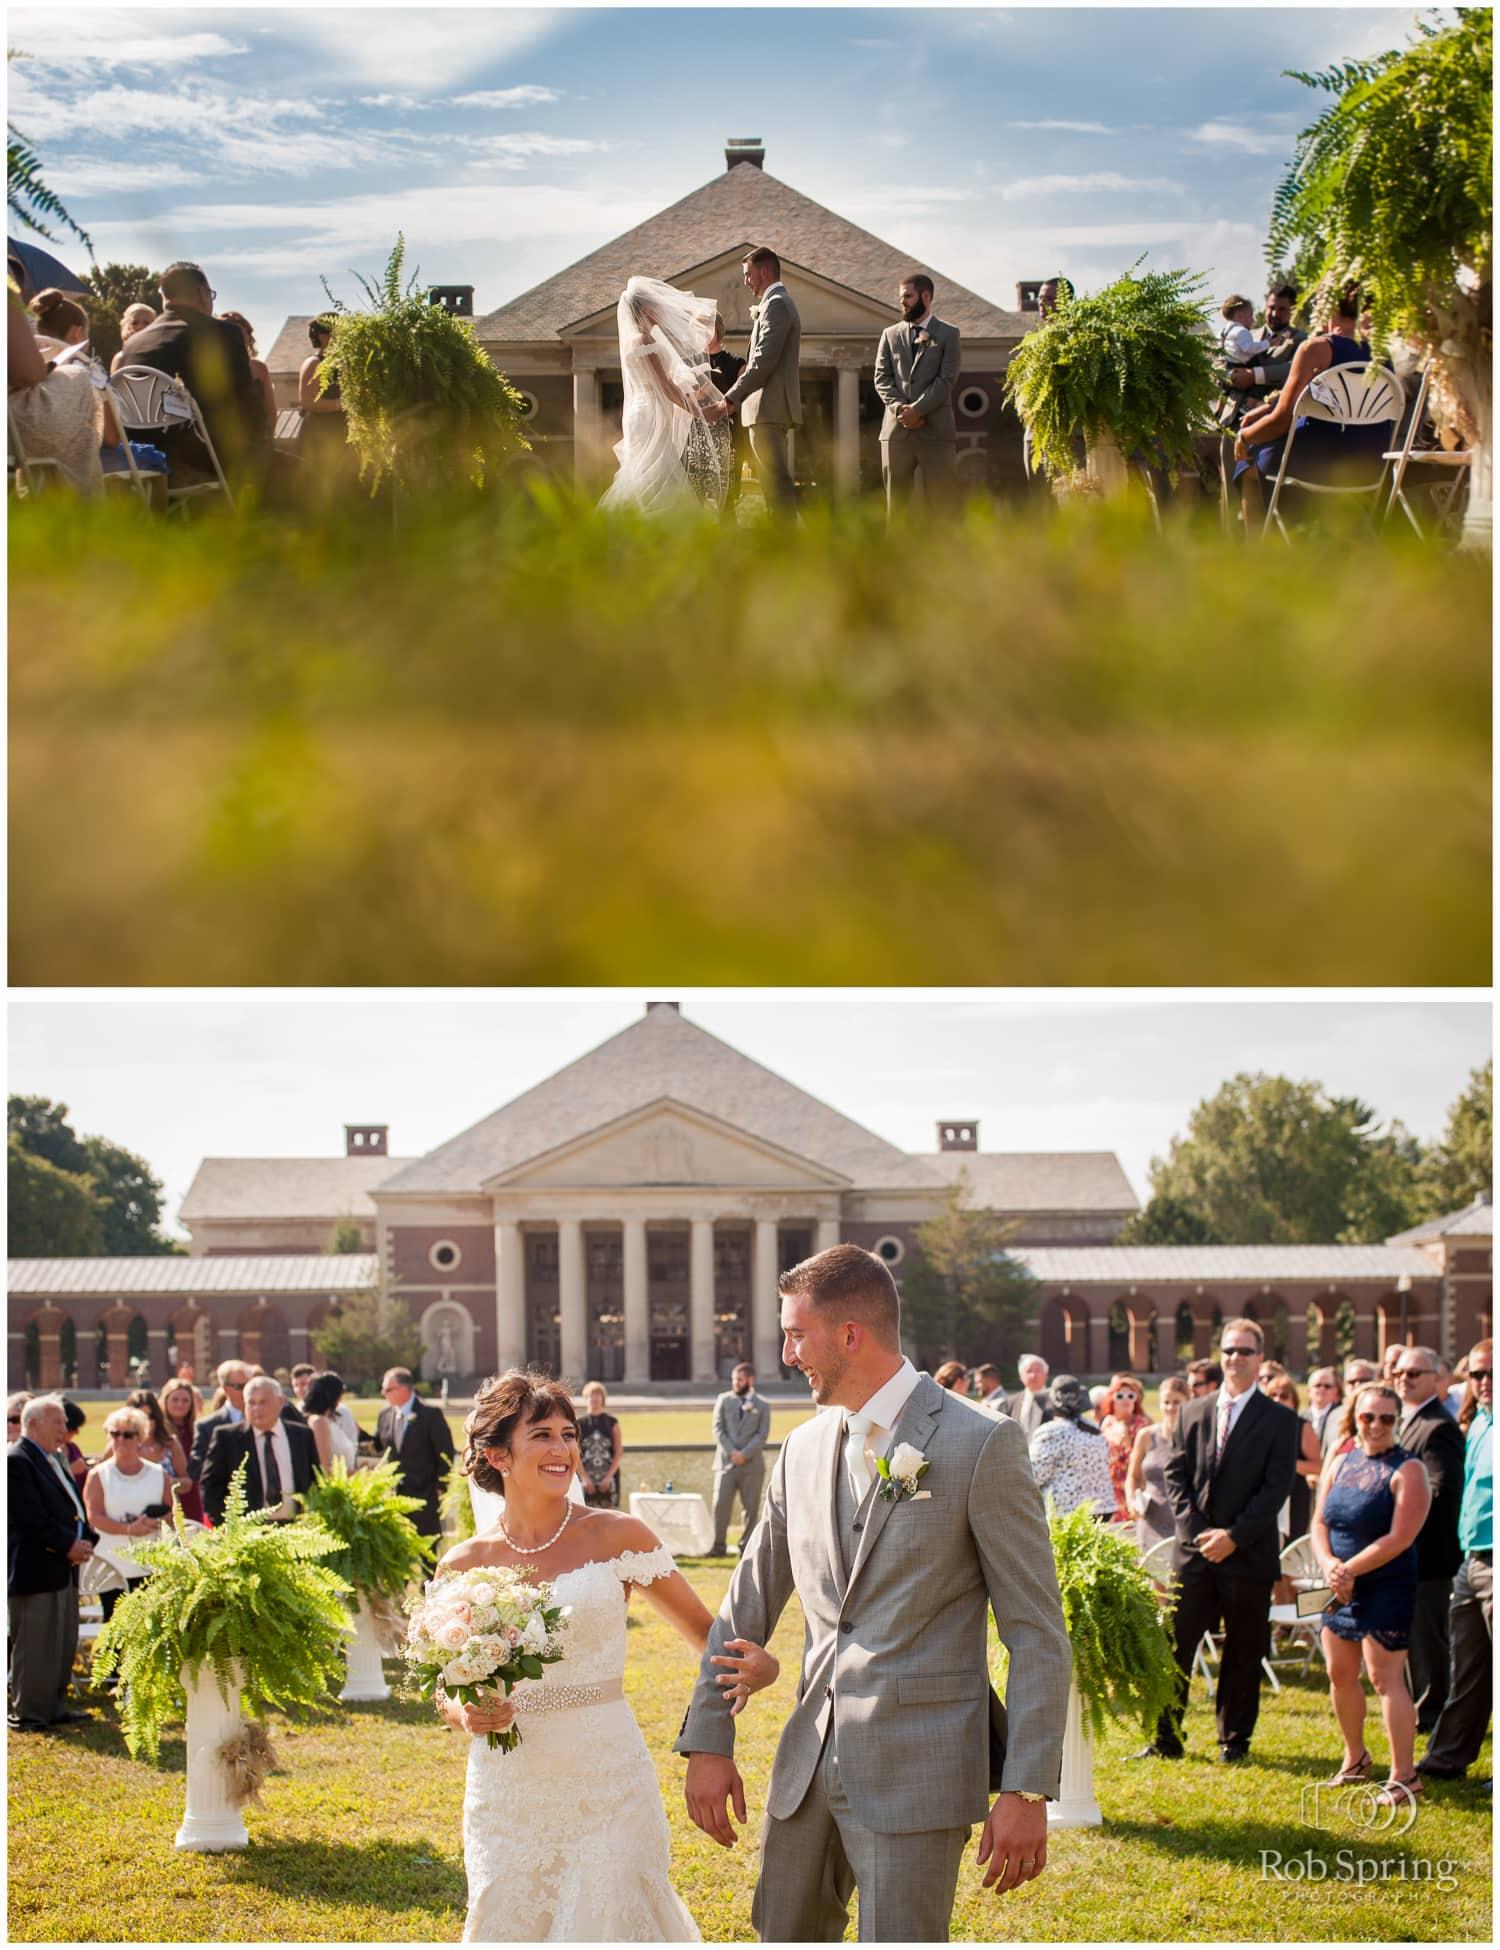 Hall of Springs outdoor ceremony, Saratoga Springs wedding photos